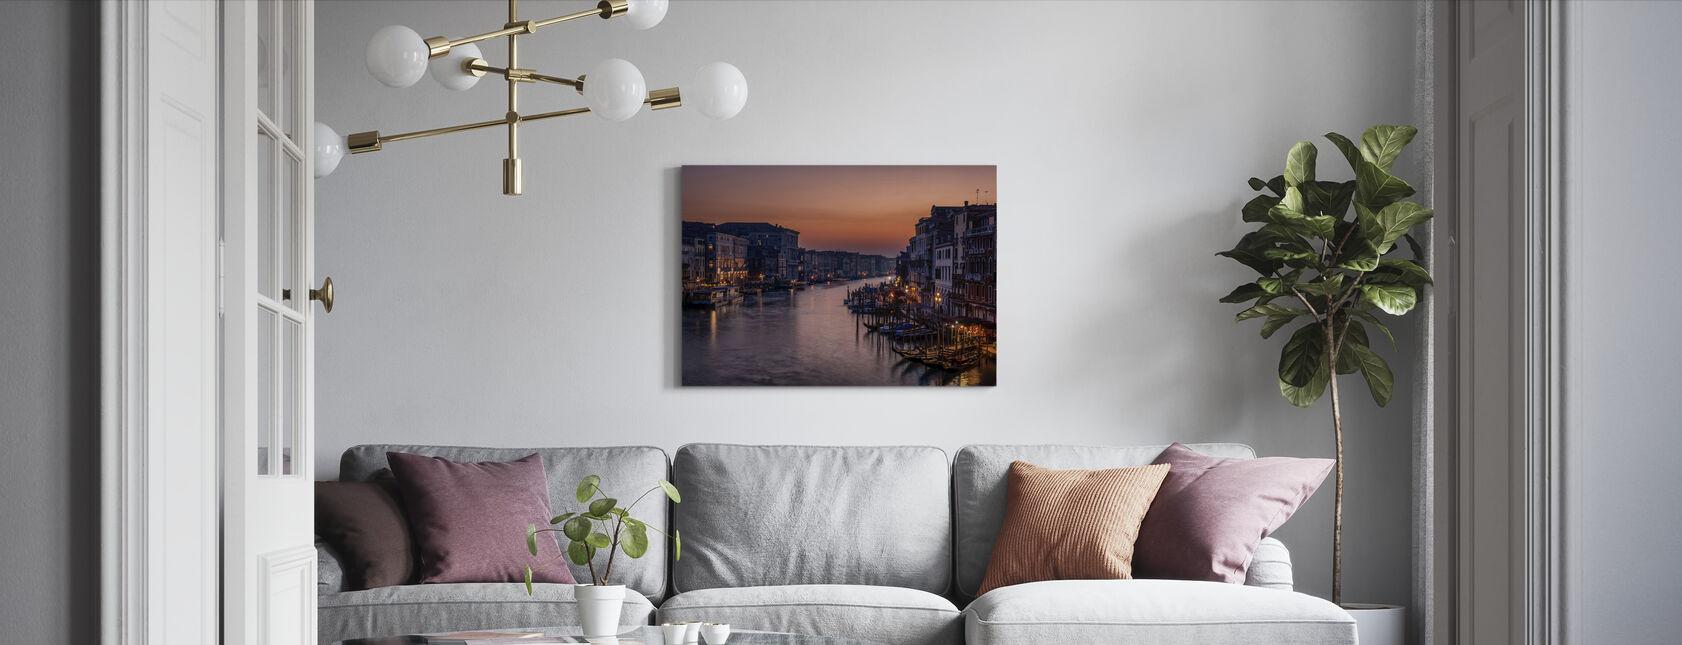 Venice Grand Canal vid Sunset - Canvastavla - Vardagsrum